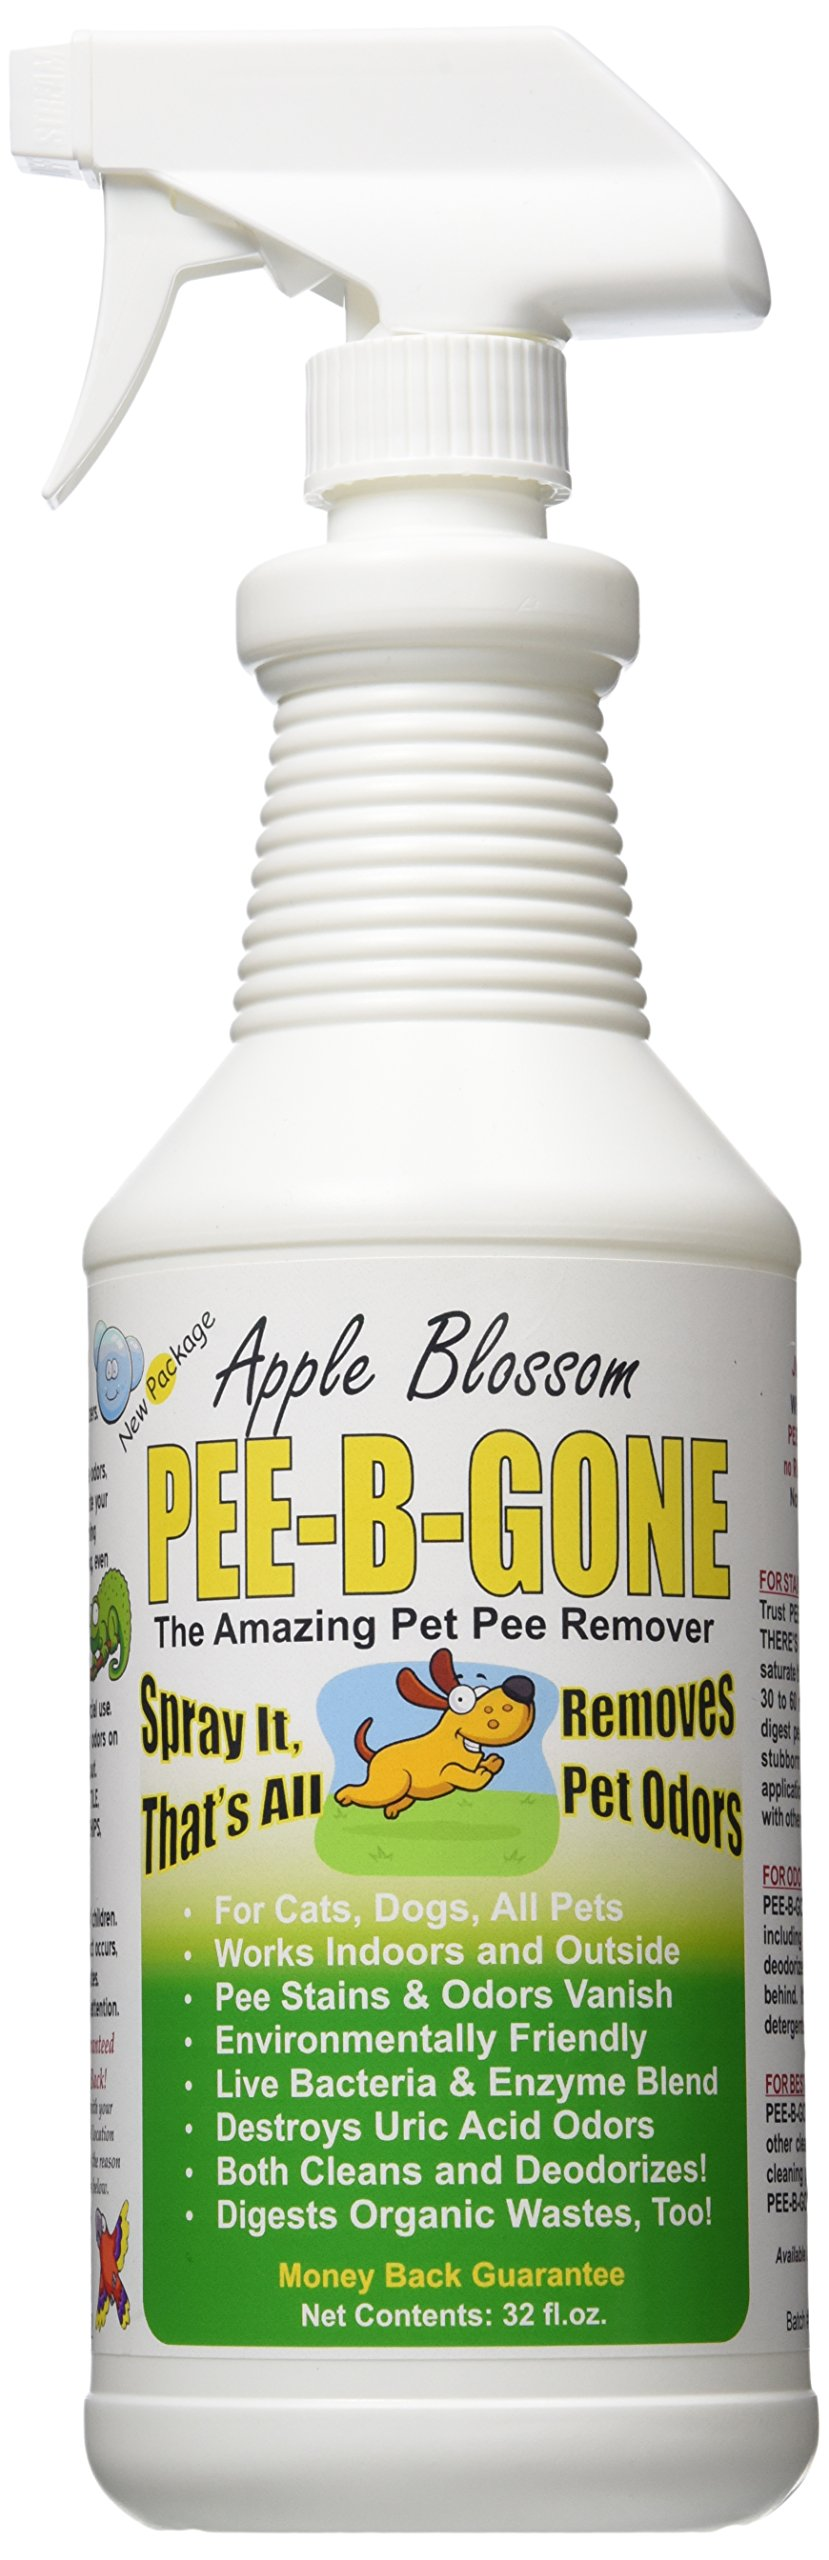 Pet Pee Be Gone Apple Blossom Spray, 32 oz.